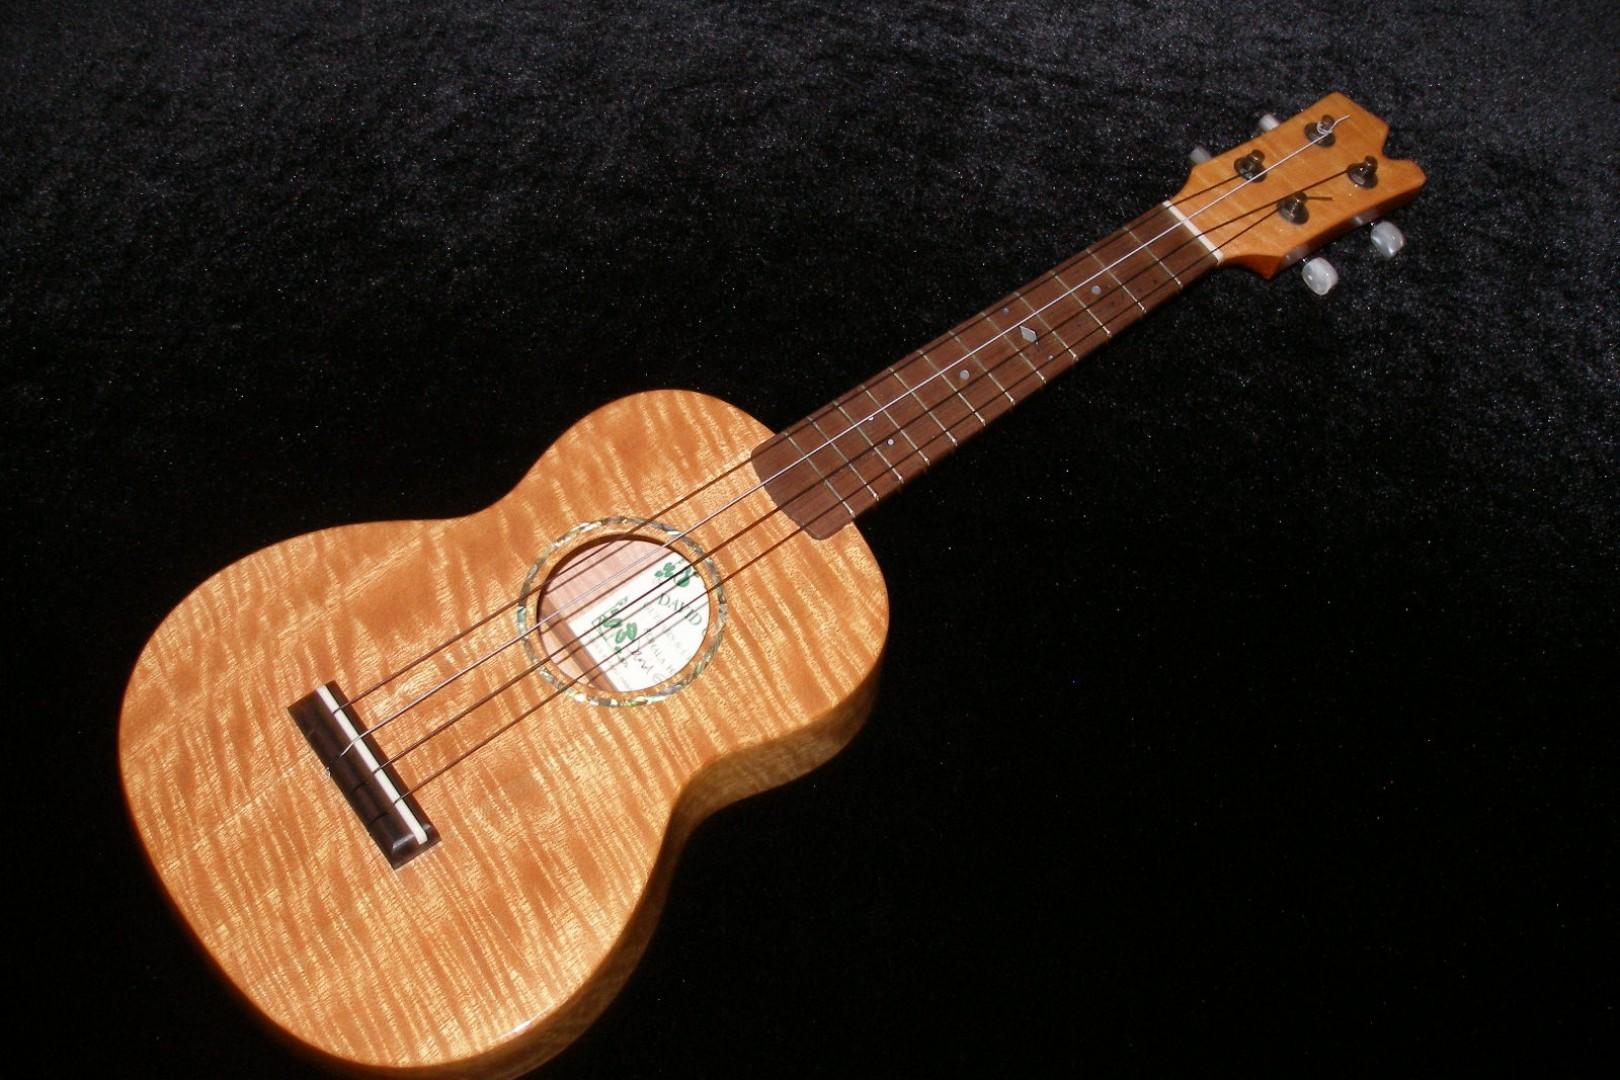 ukulele friend custom ukuleles for sale by david gomes ukulele friend. Black Bedroom Furniture Sets. Home Design Ideas